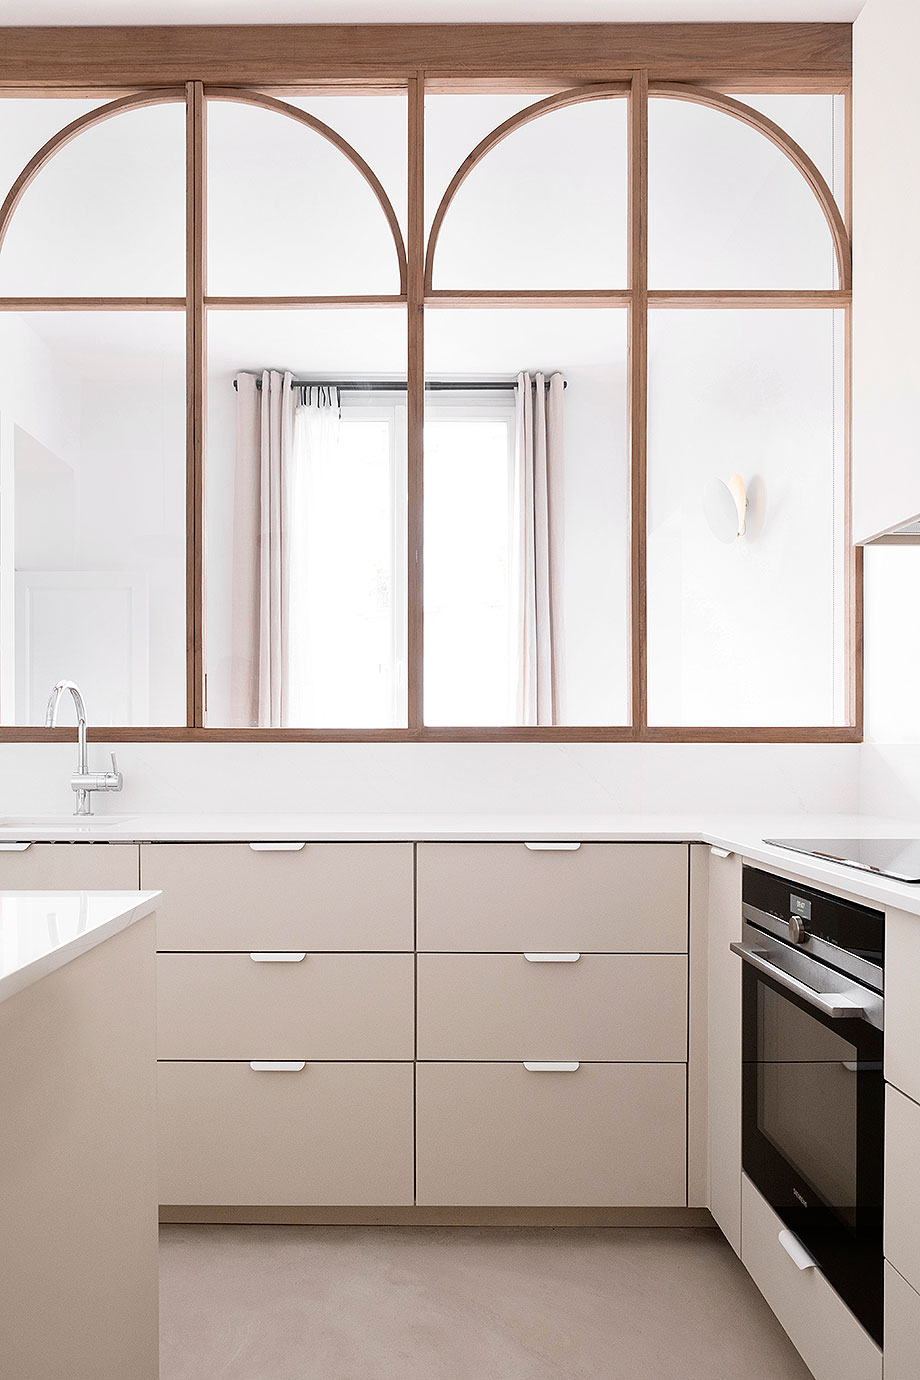 reforma integral de un apartamento en paris por anthropie architecture (s) (2) - foto juliette alexandre